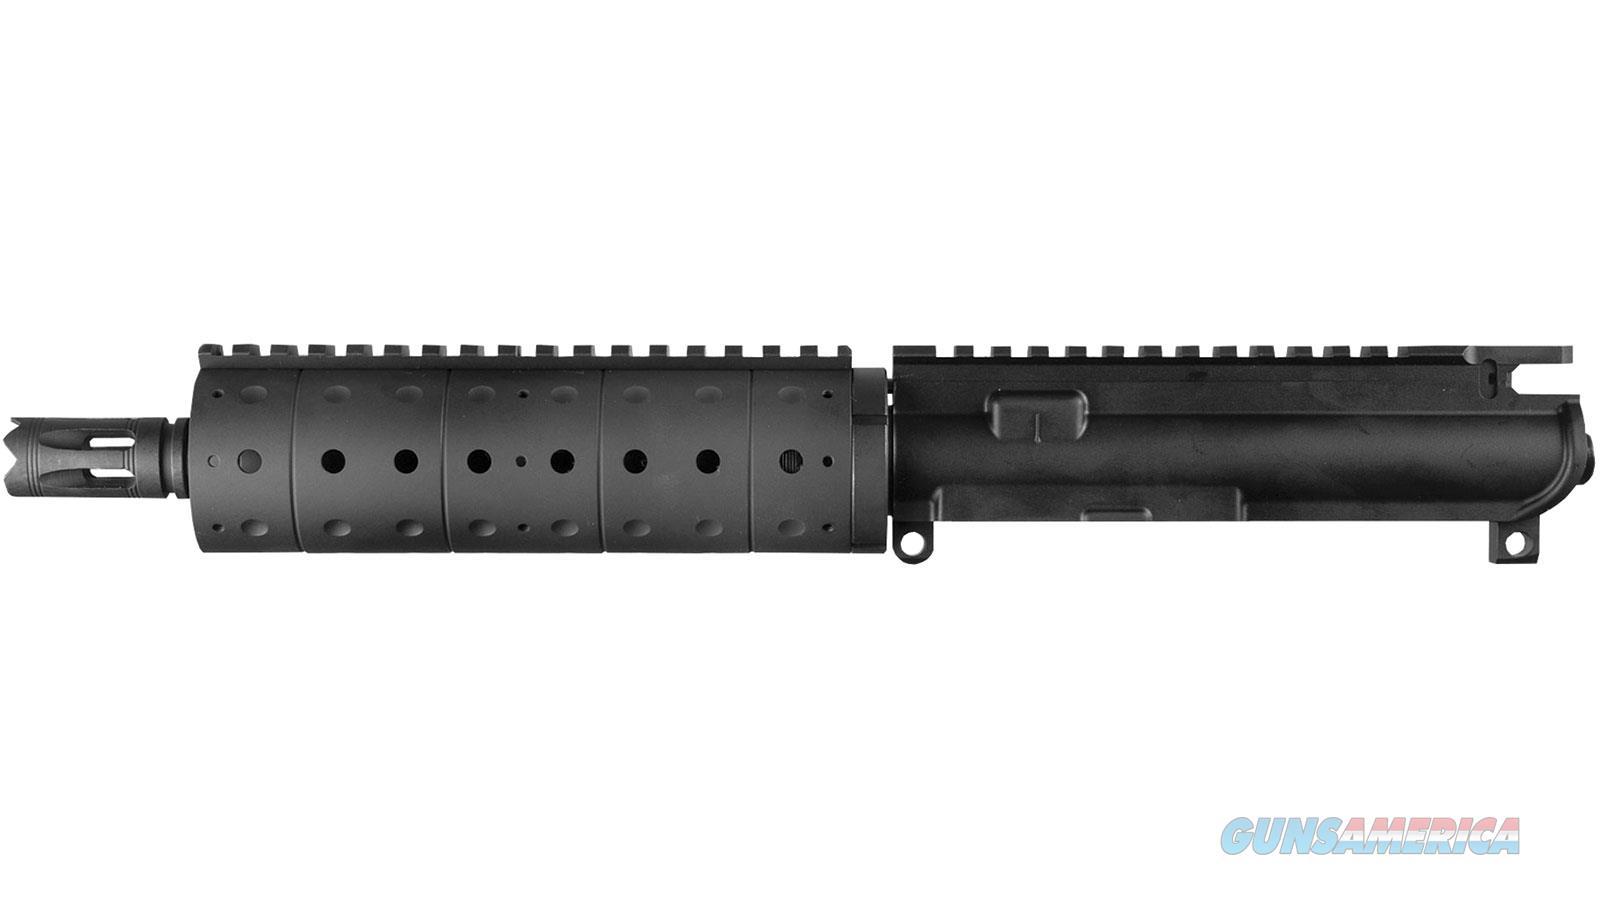 "Anderson Mfg. 7.5"" Upper No Bcg Or 74610-UP-7.5  Non-Guns > Gun Parts > M16-AR15 > Upper Only"